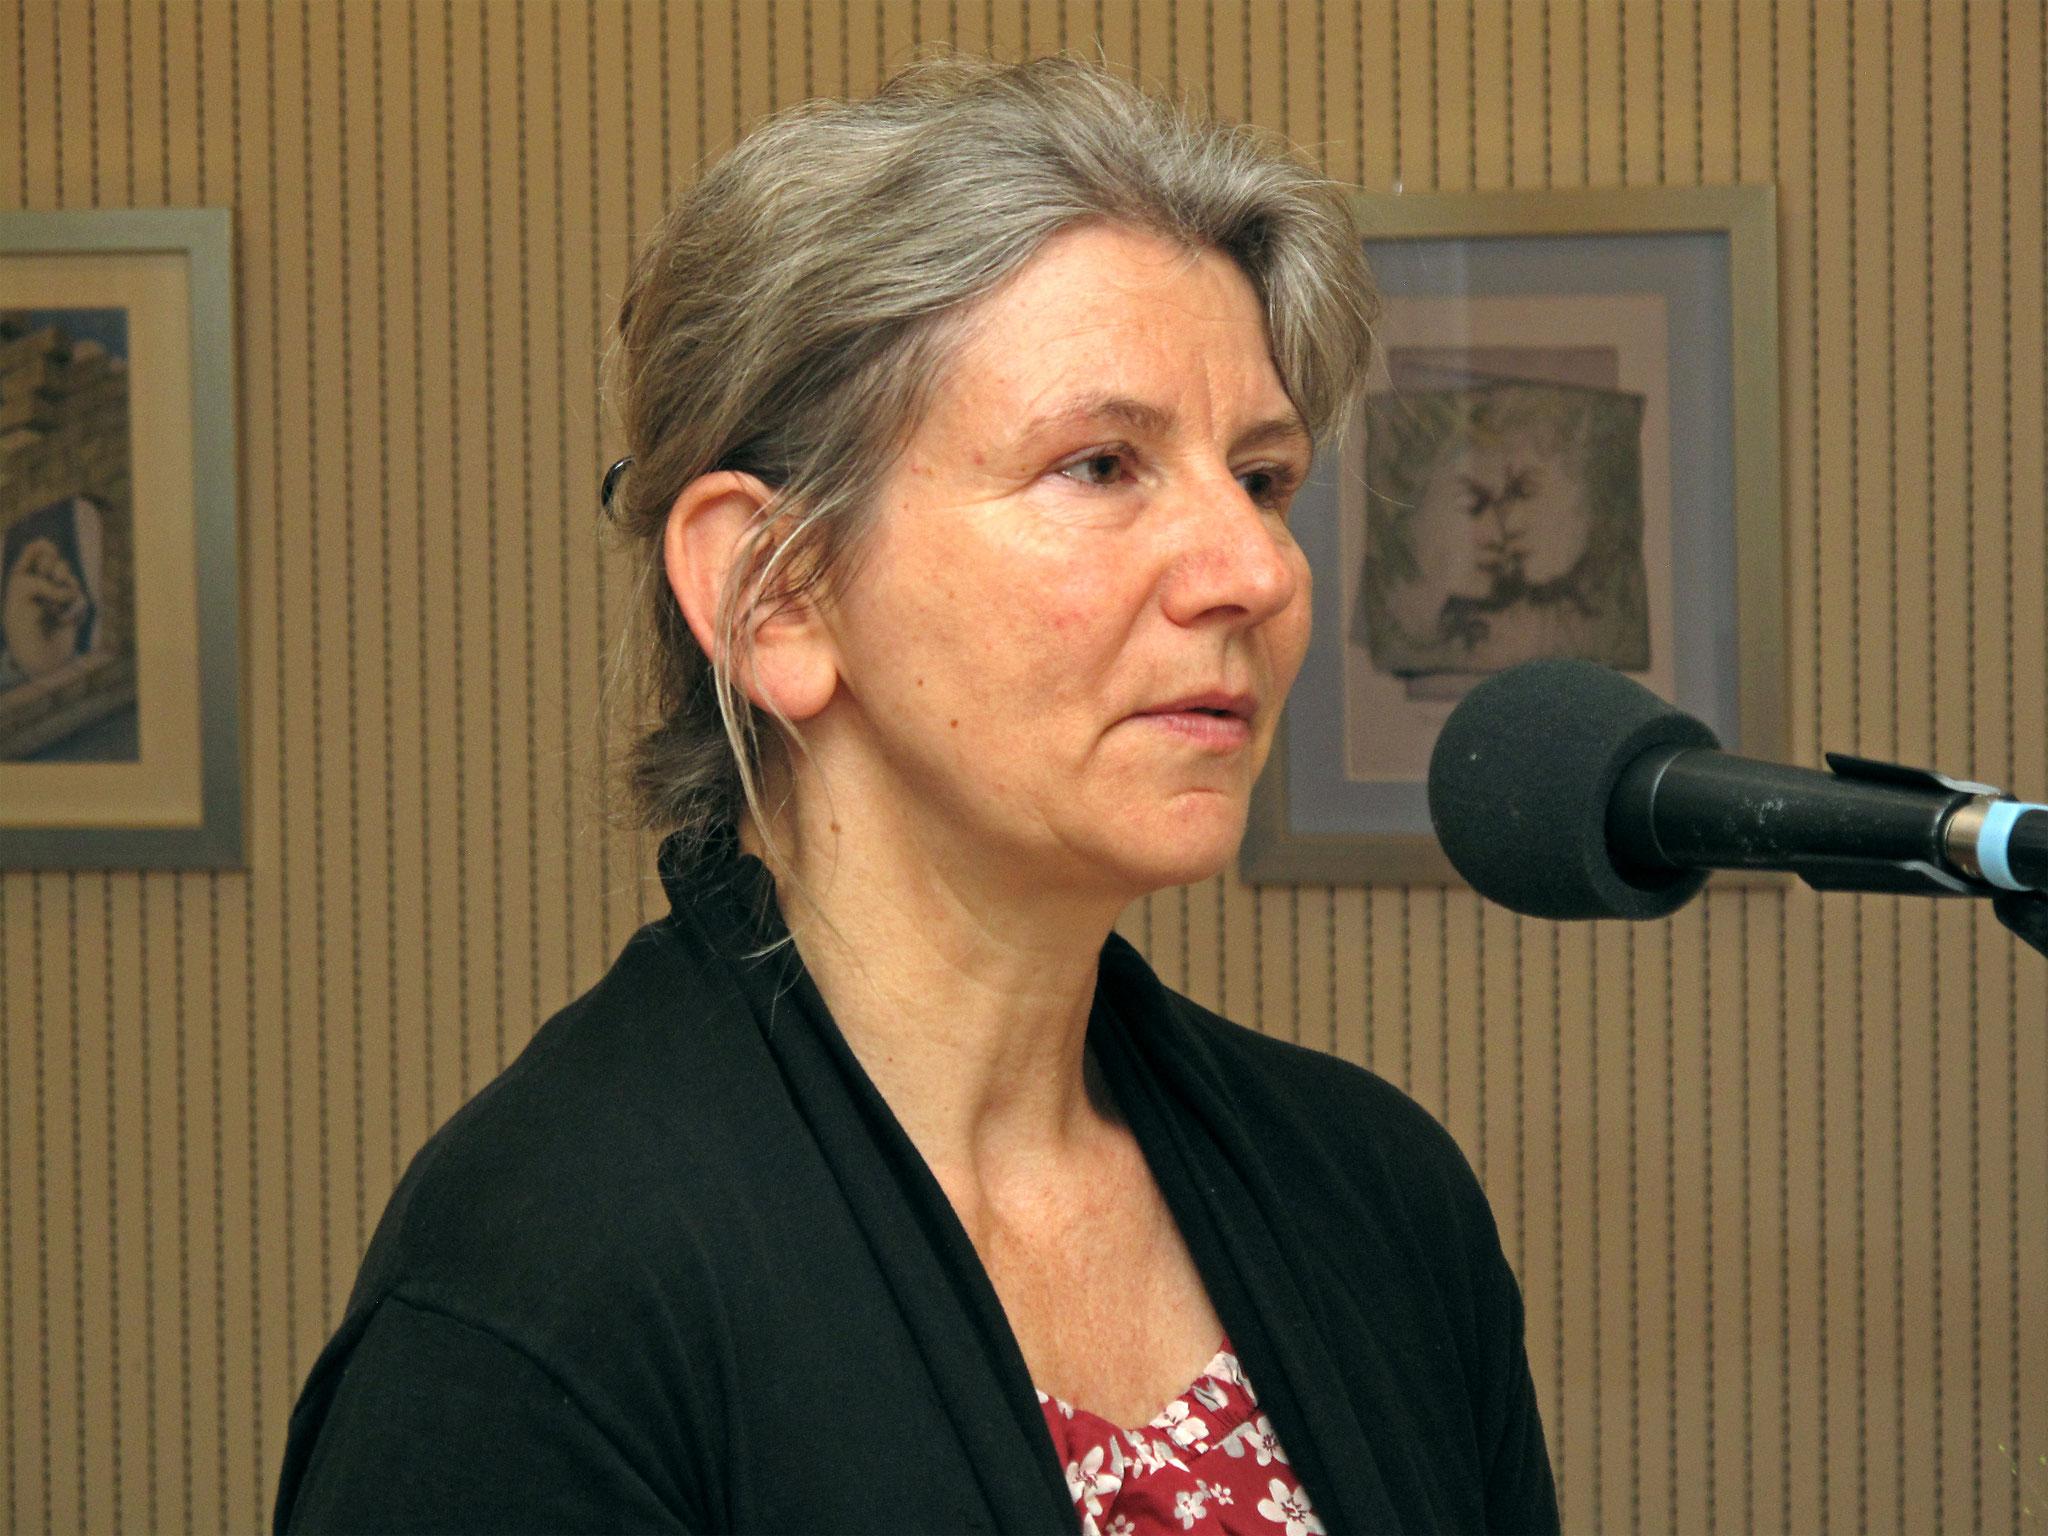 Frau Dorothea Loosli - Benevol Biel/Bienne